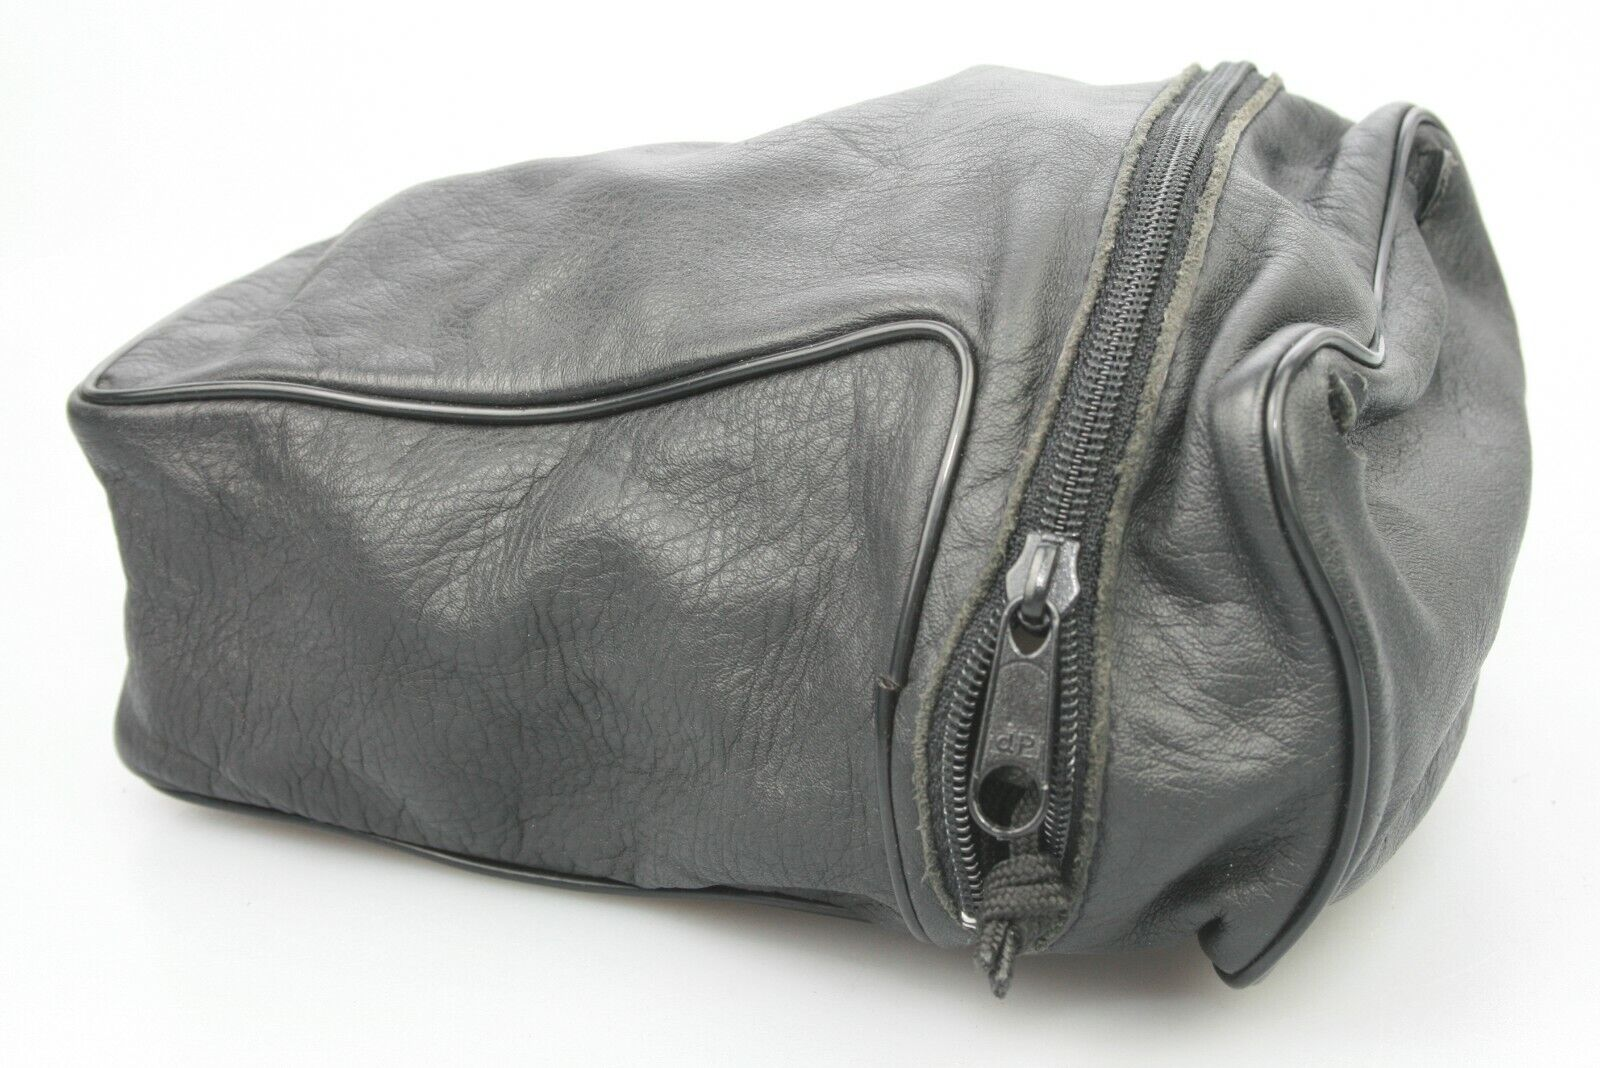 Original Benser Large TELE LEICA M soft CAMERA POUCH CASE Real Leather ZIP BAG